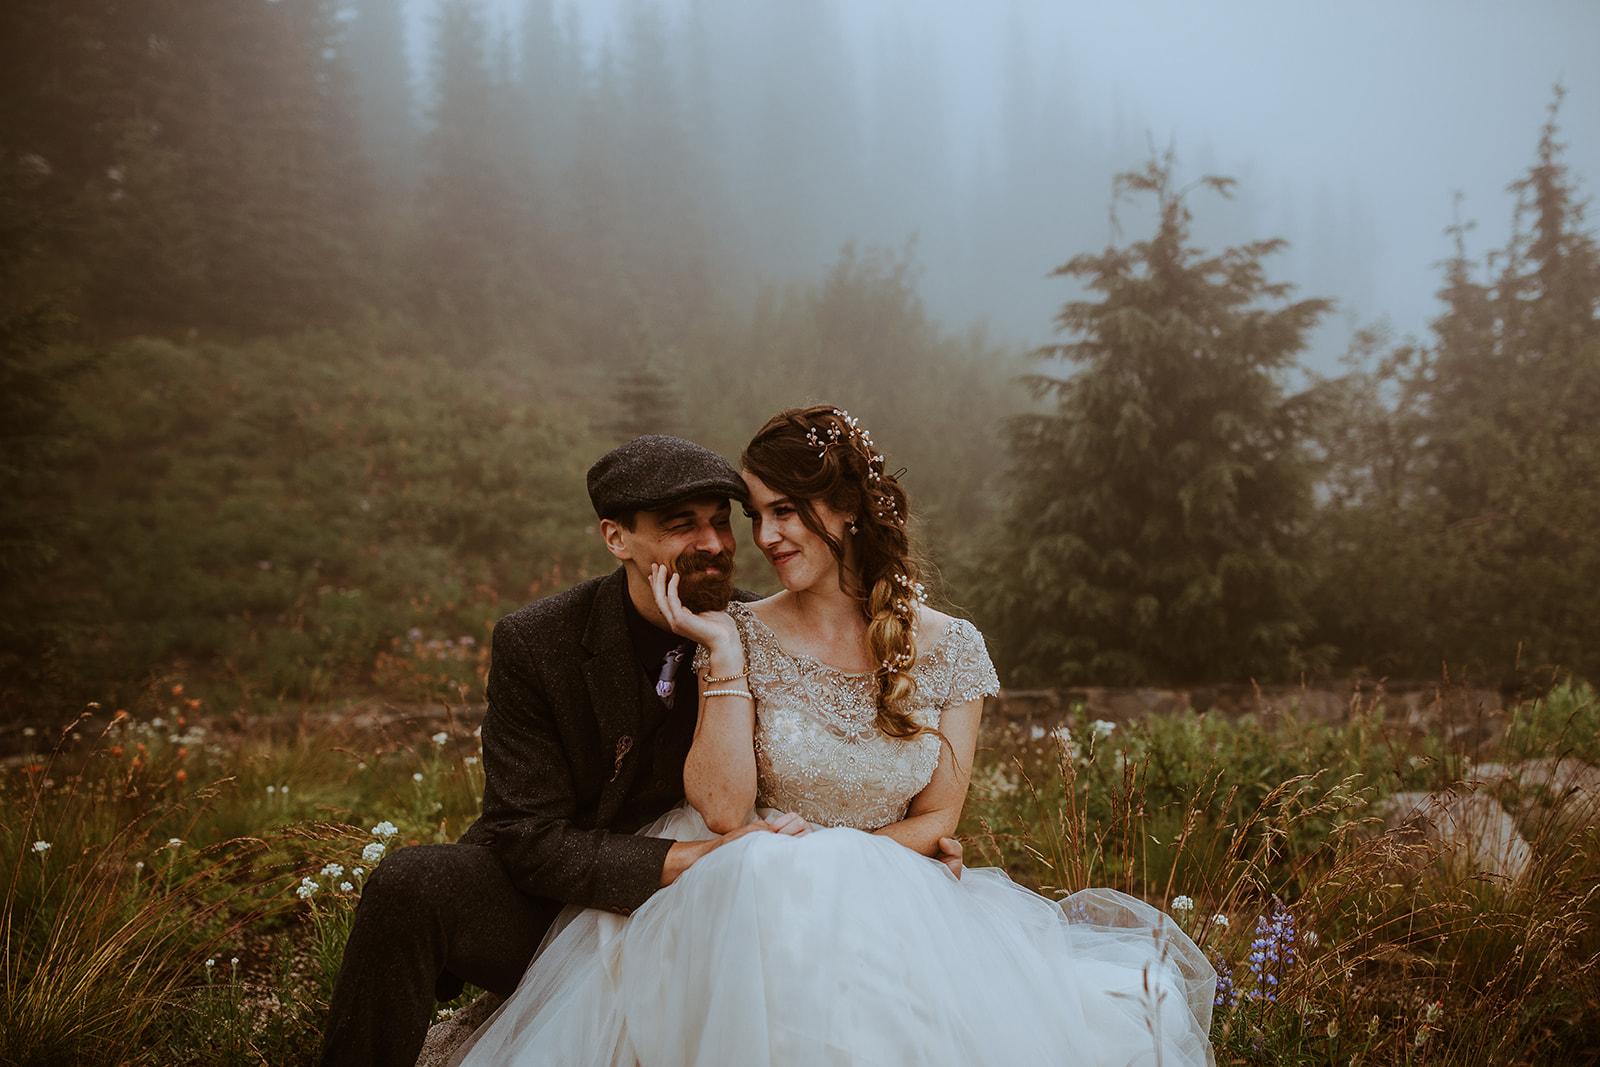 mount-rainier-cabin-elopement-megan-gallagher-photography_(408_of_568).jpg